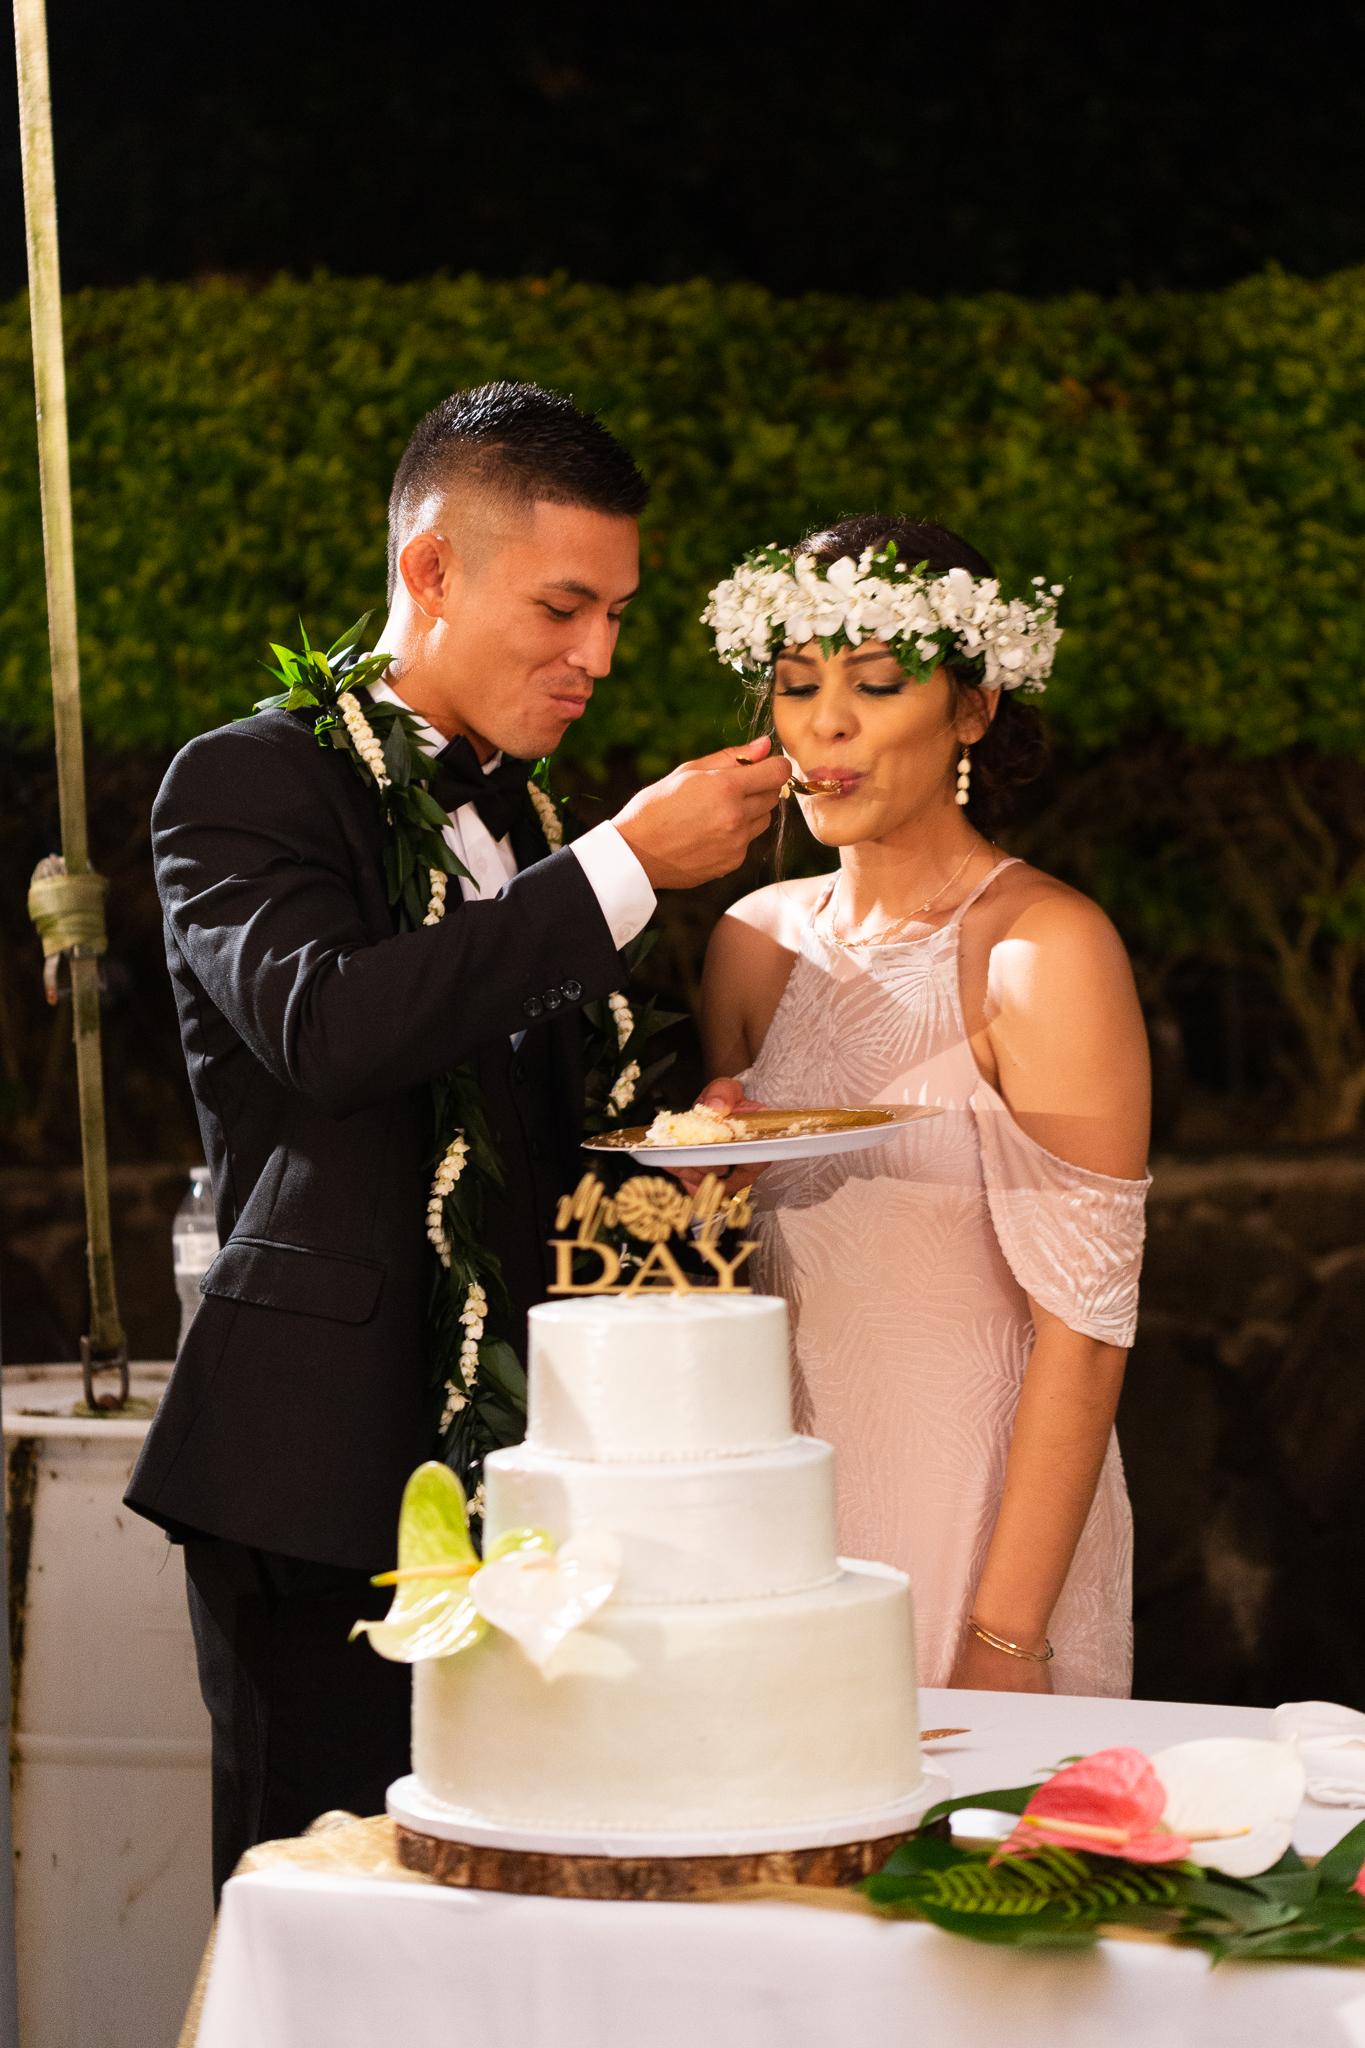 Kualoa_Ranch_Wedding_Photographer_Tone_Hawaii-44.jpg